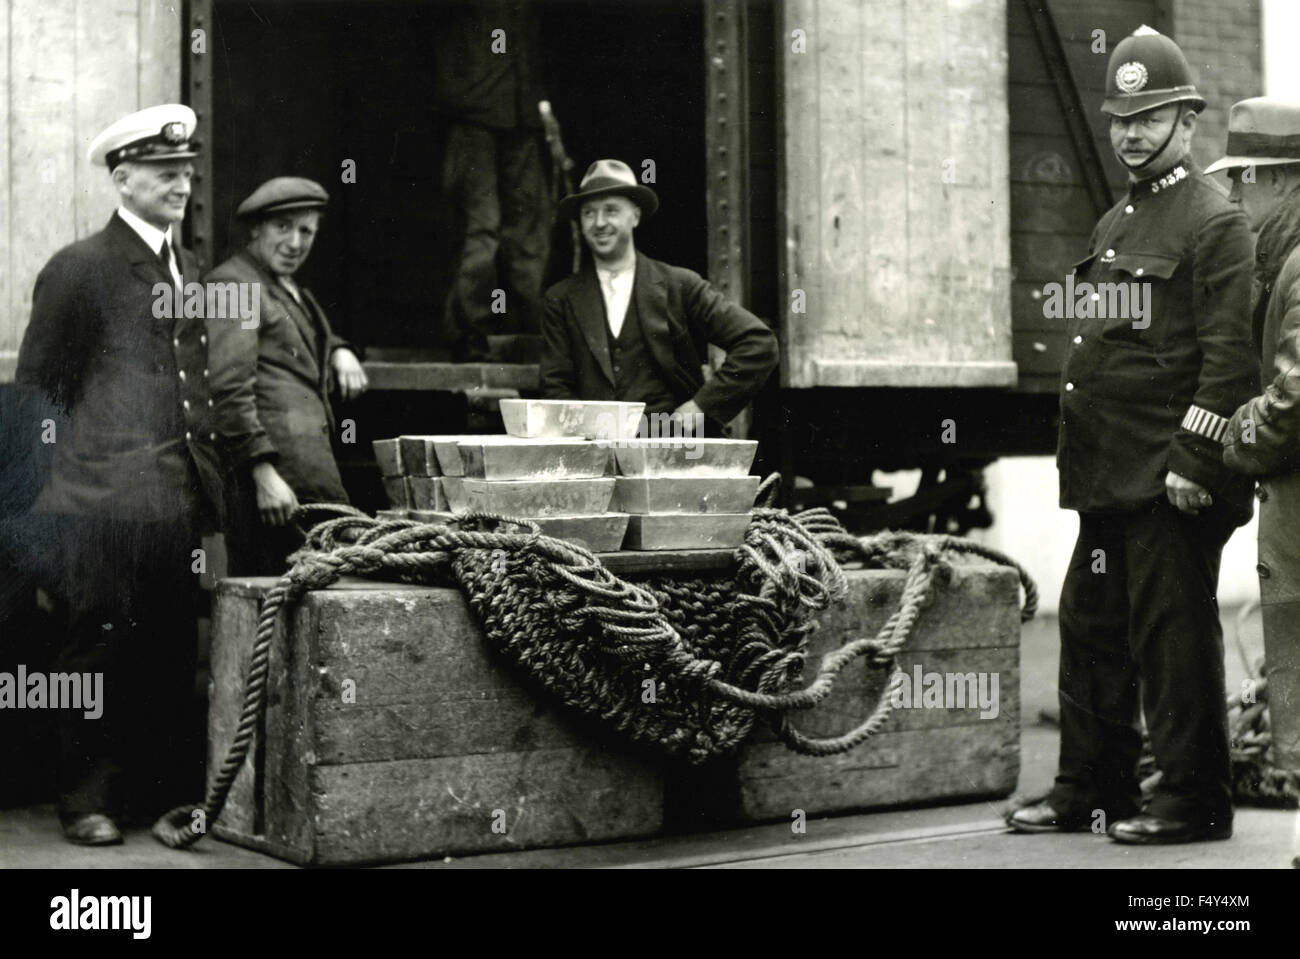 The MV President Roosevelt charging aboard the silver bullion, Southampton, UK - Stock Image